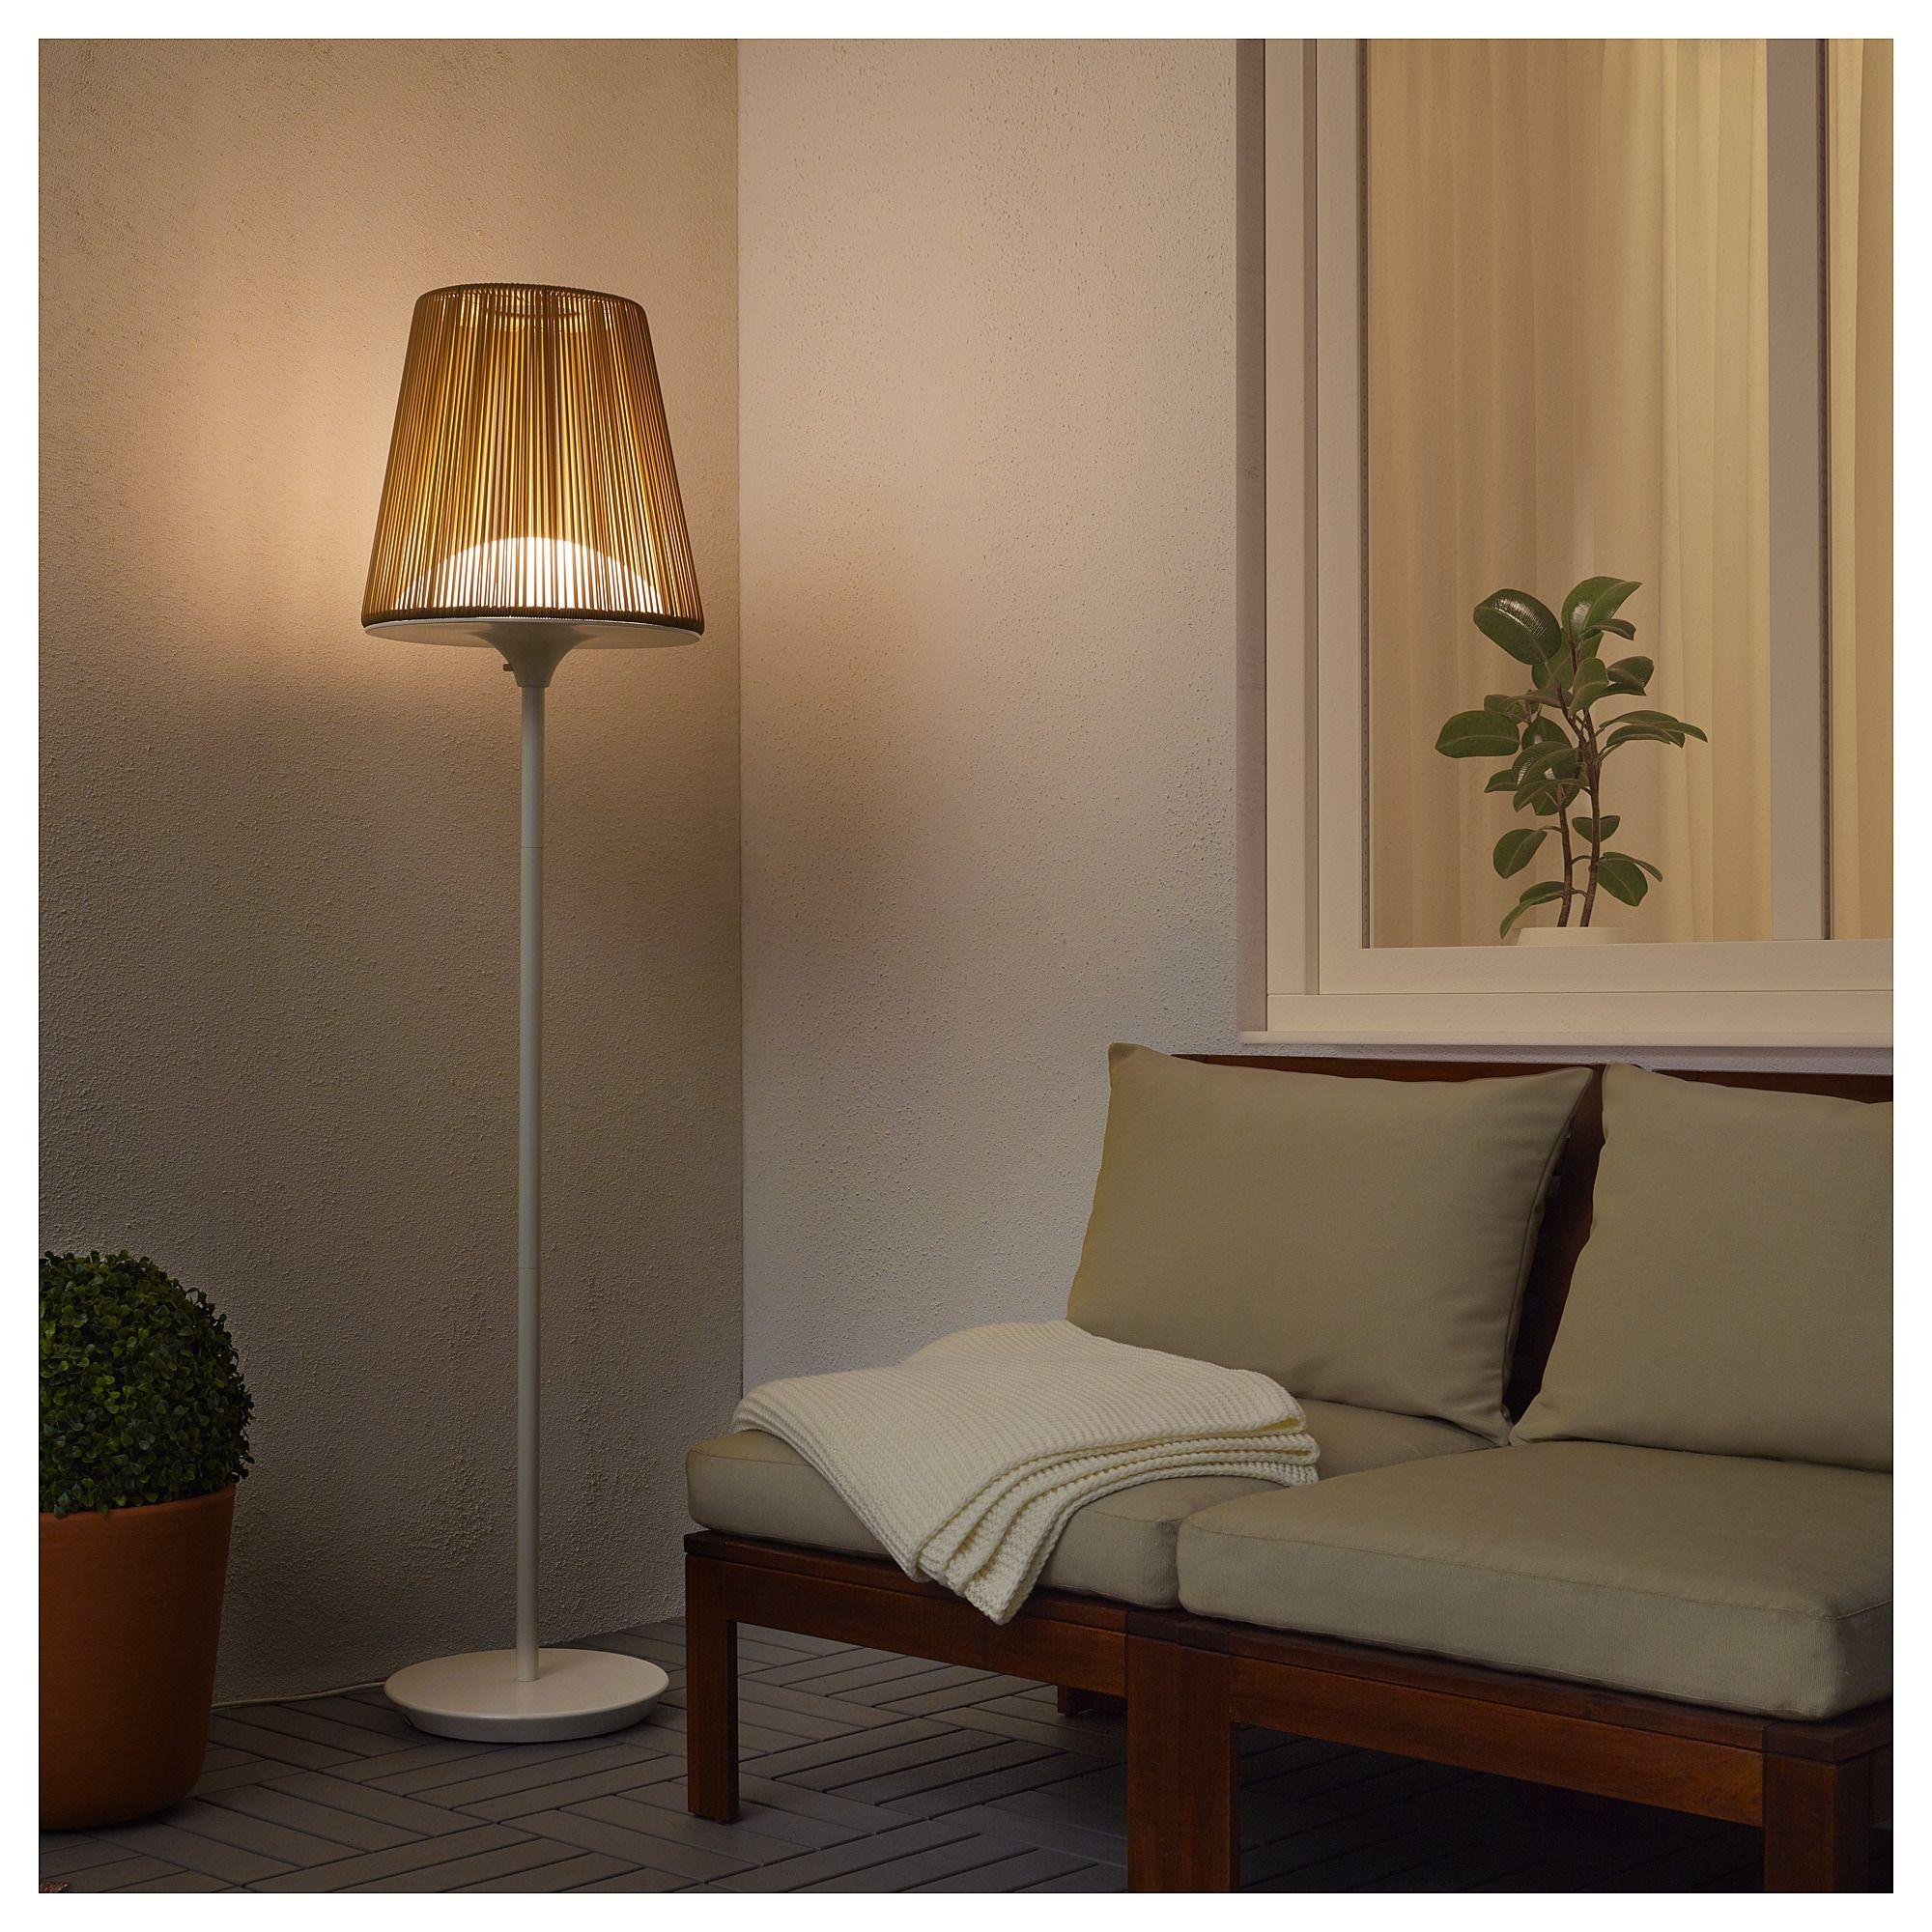 Furniture And Home Furnishings Floor Lamp Ikea Floor Lamp